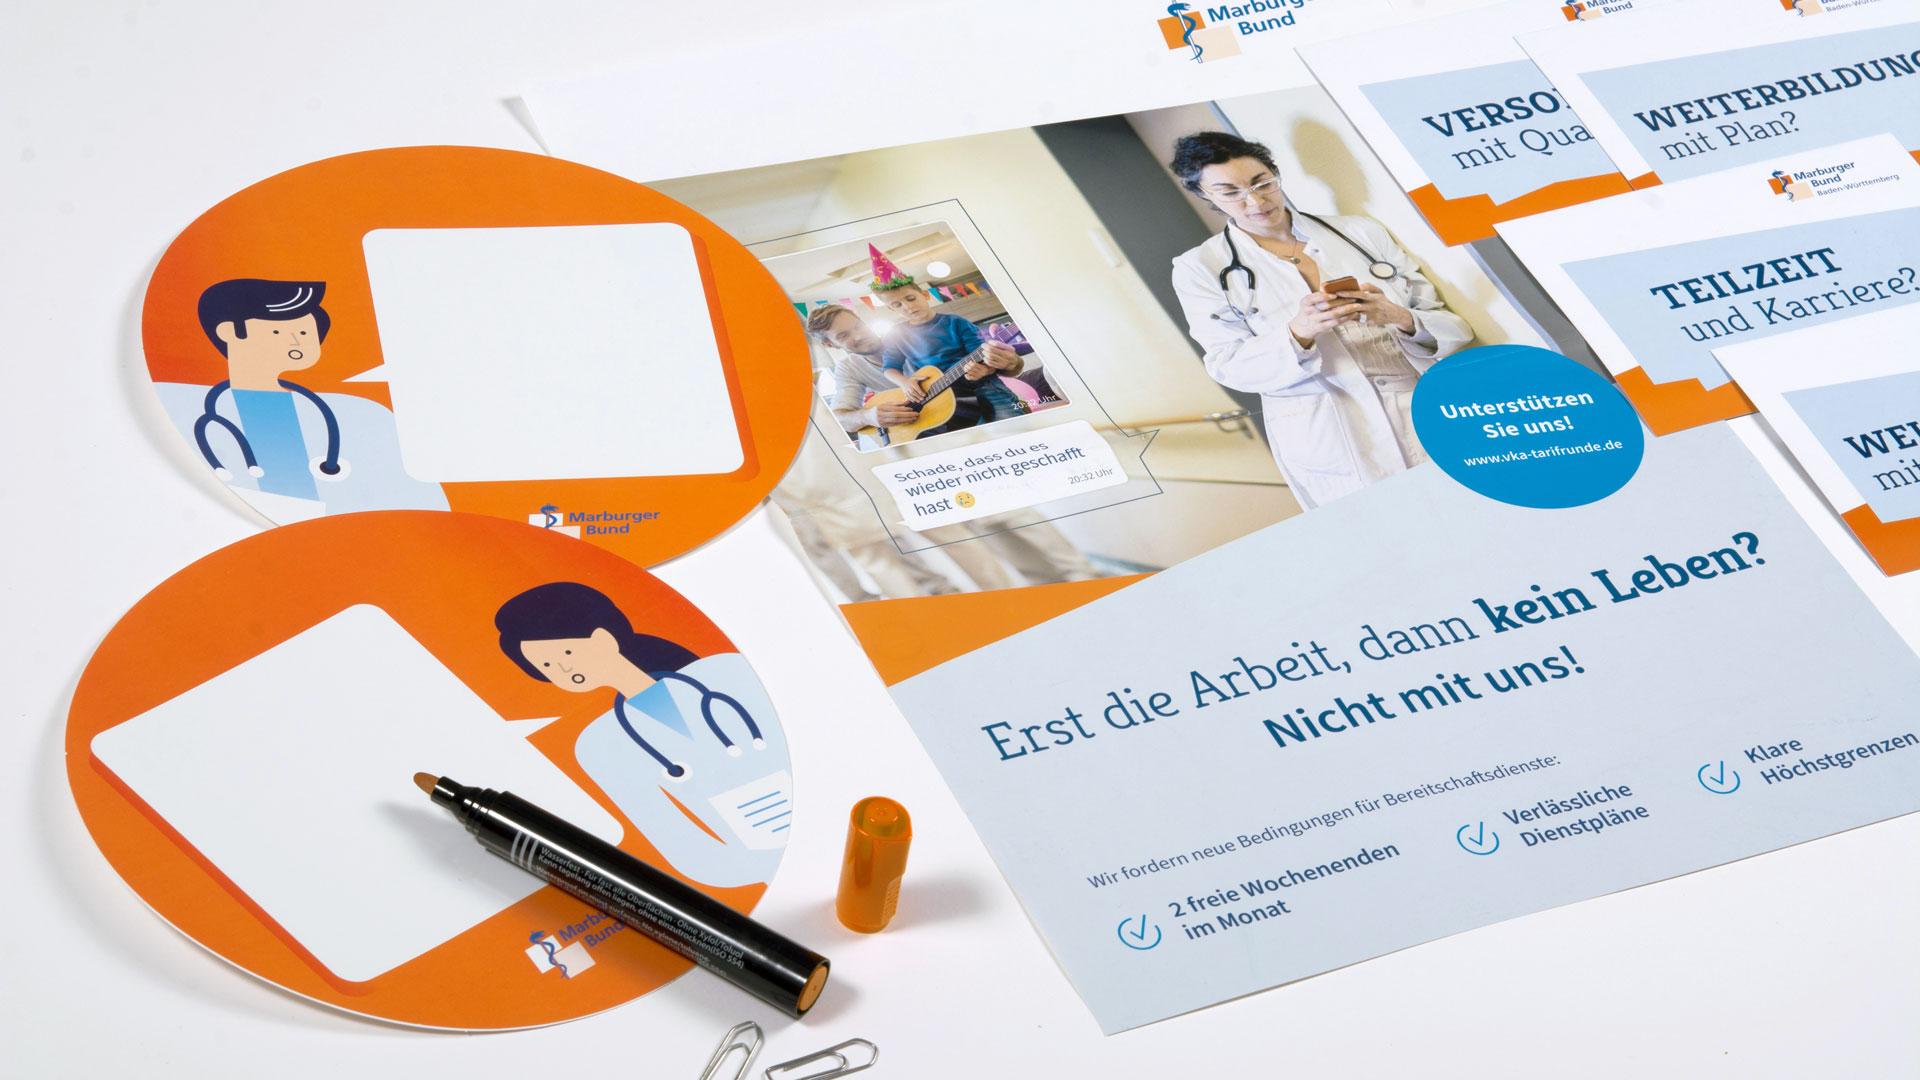 Kampagnenmaterialien Marburger Bund